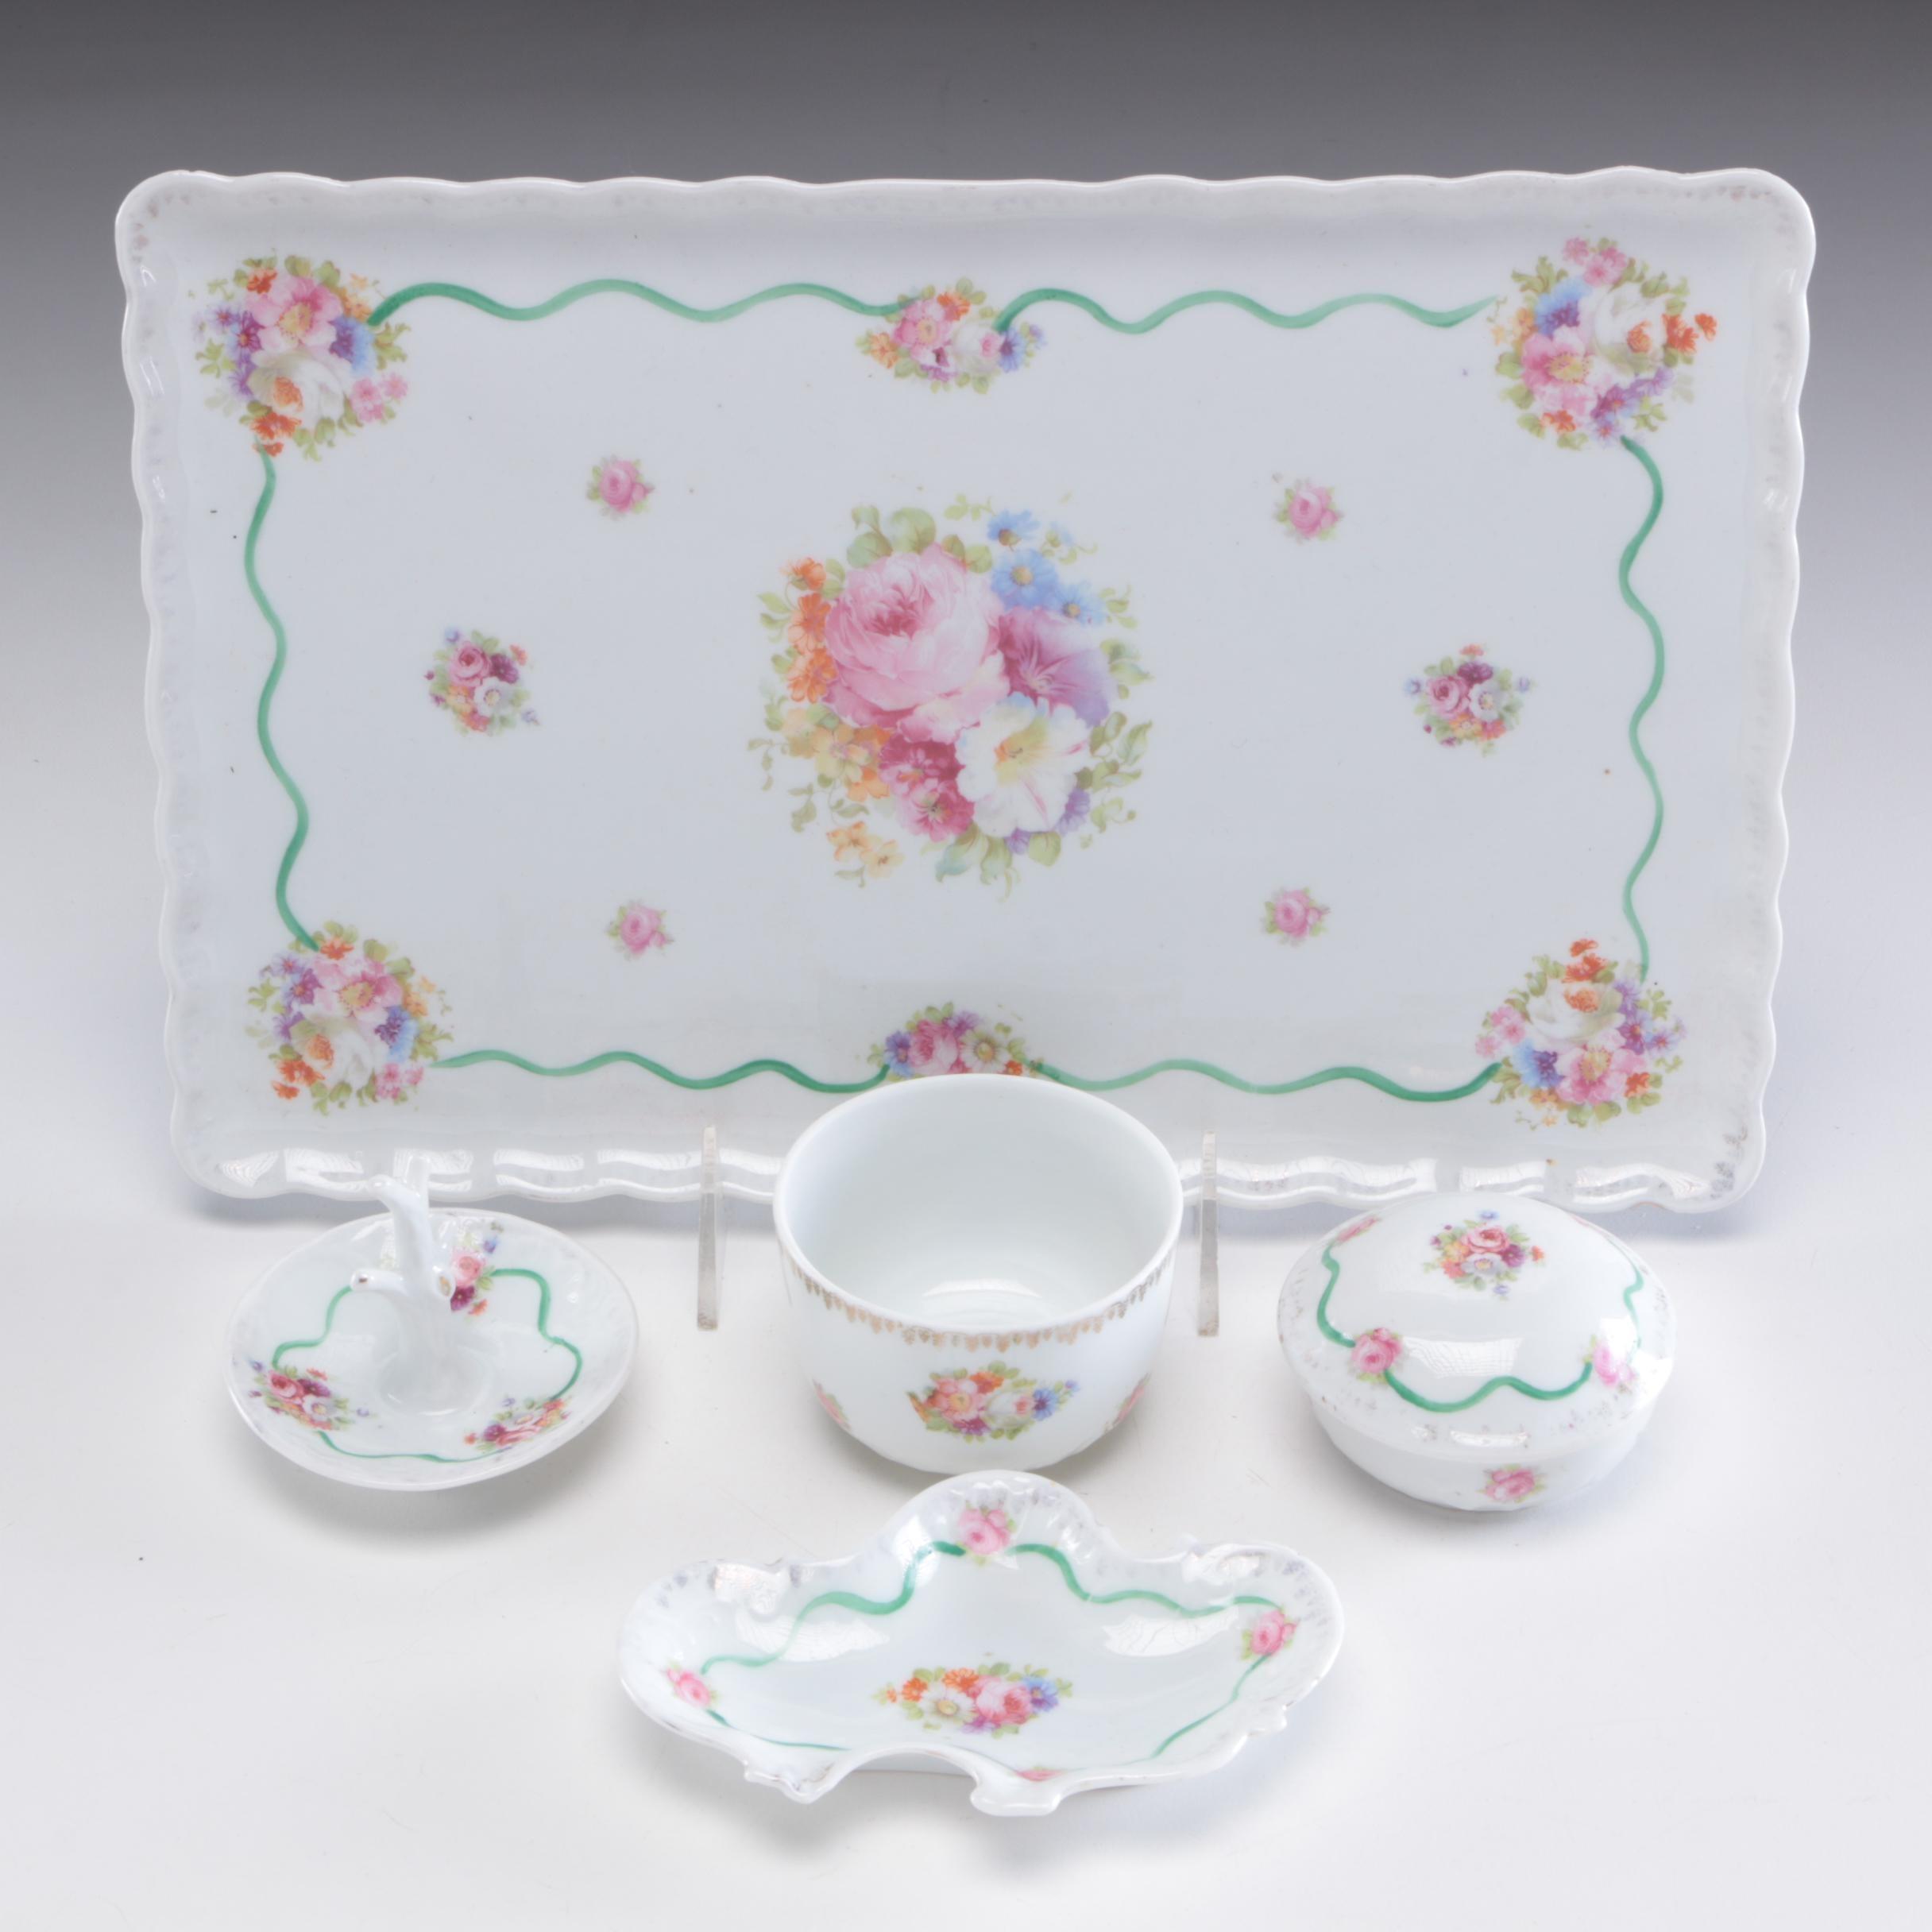 Victoria Austria Porcelain Serveware, Early to Mid 20th Century